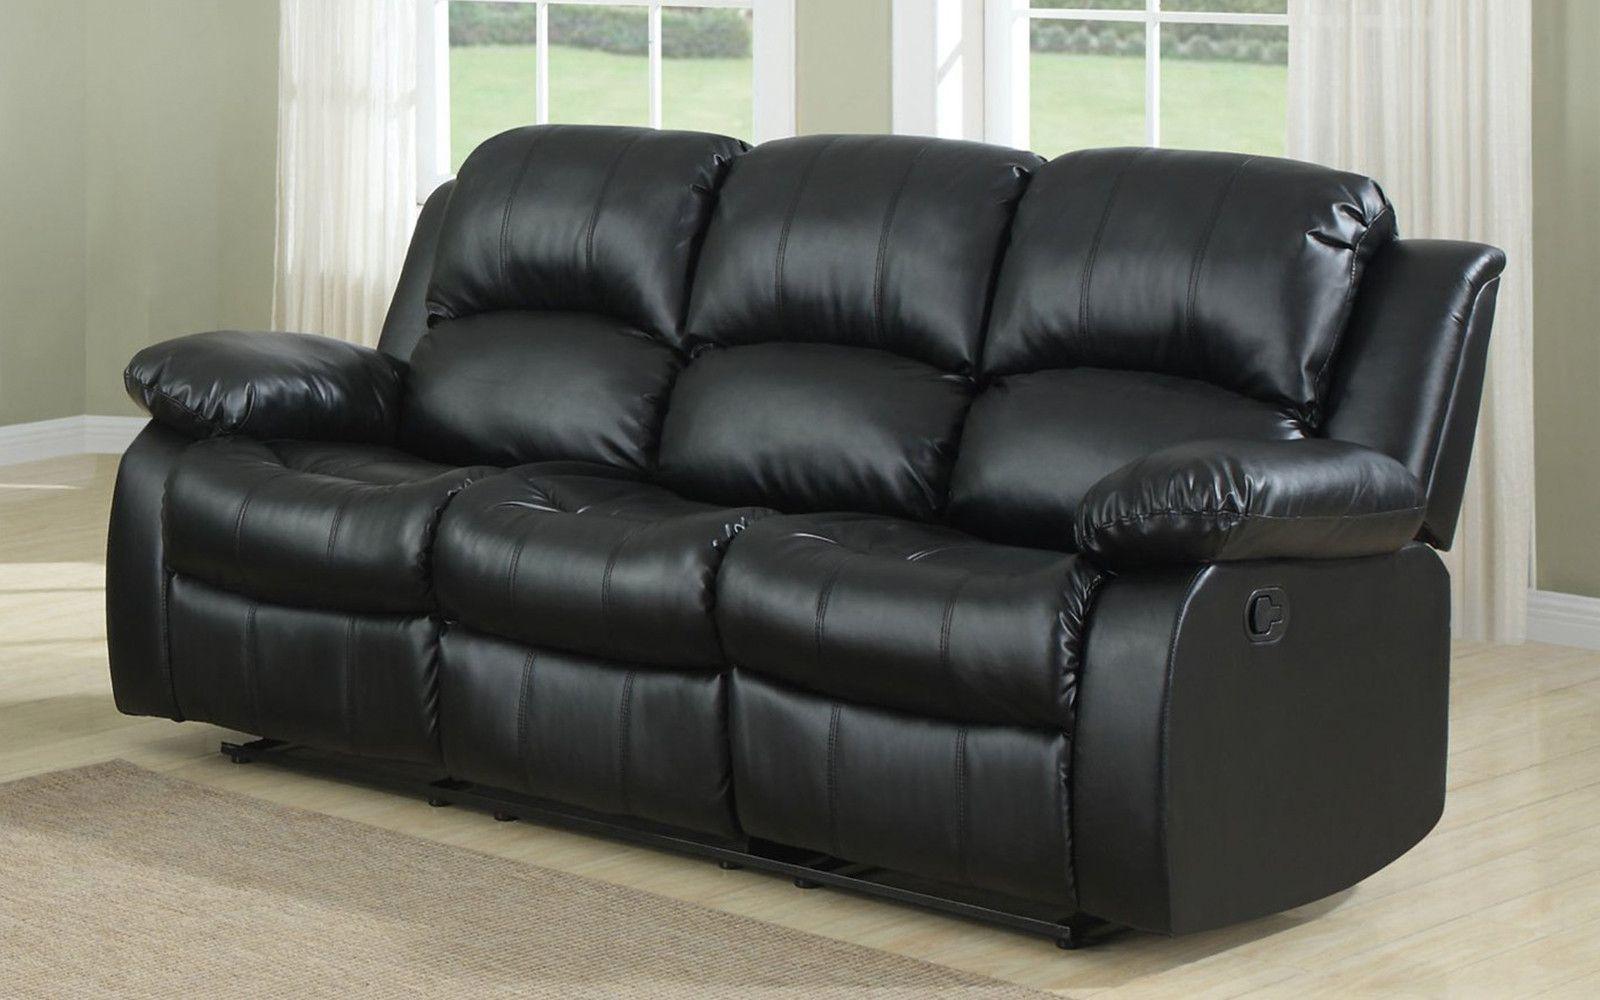 Ikea Sofa Bed Bob Classic Bonded Leather Recliner Sofa